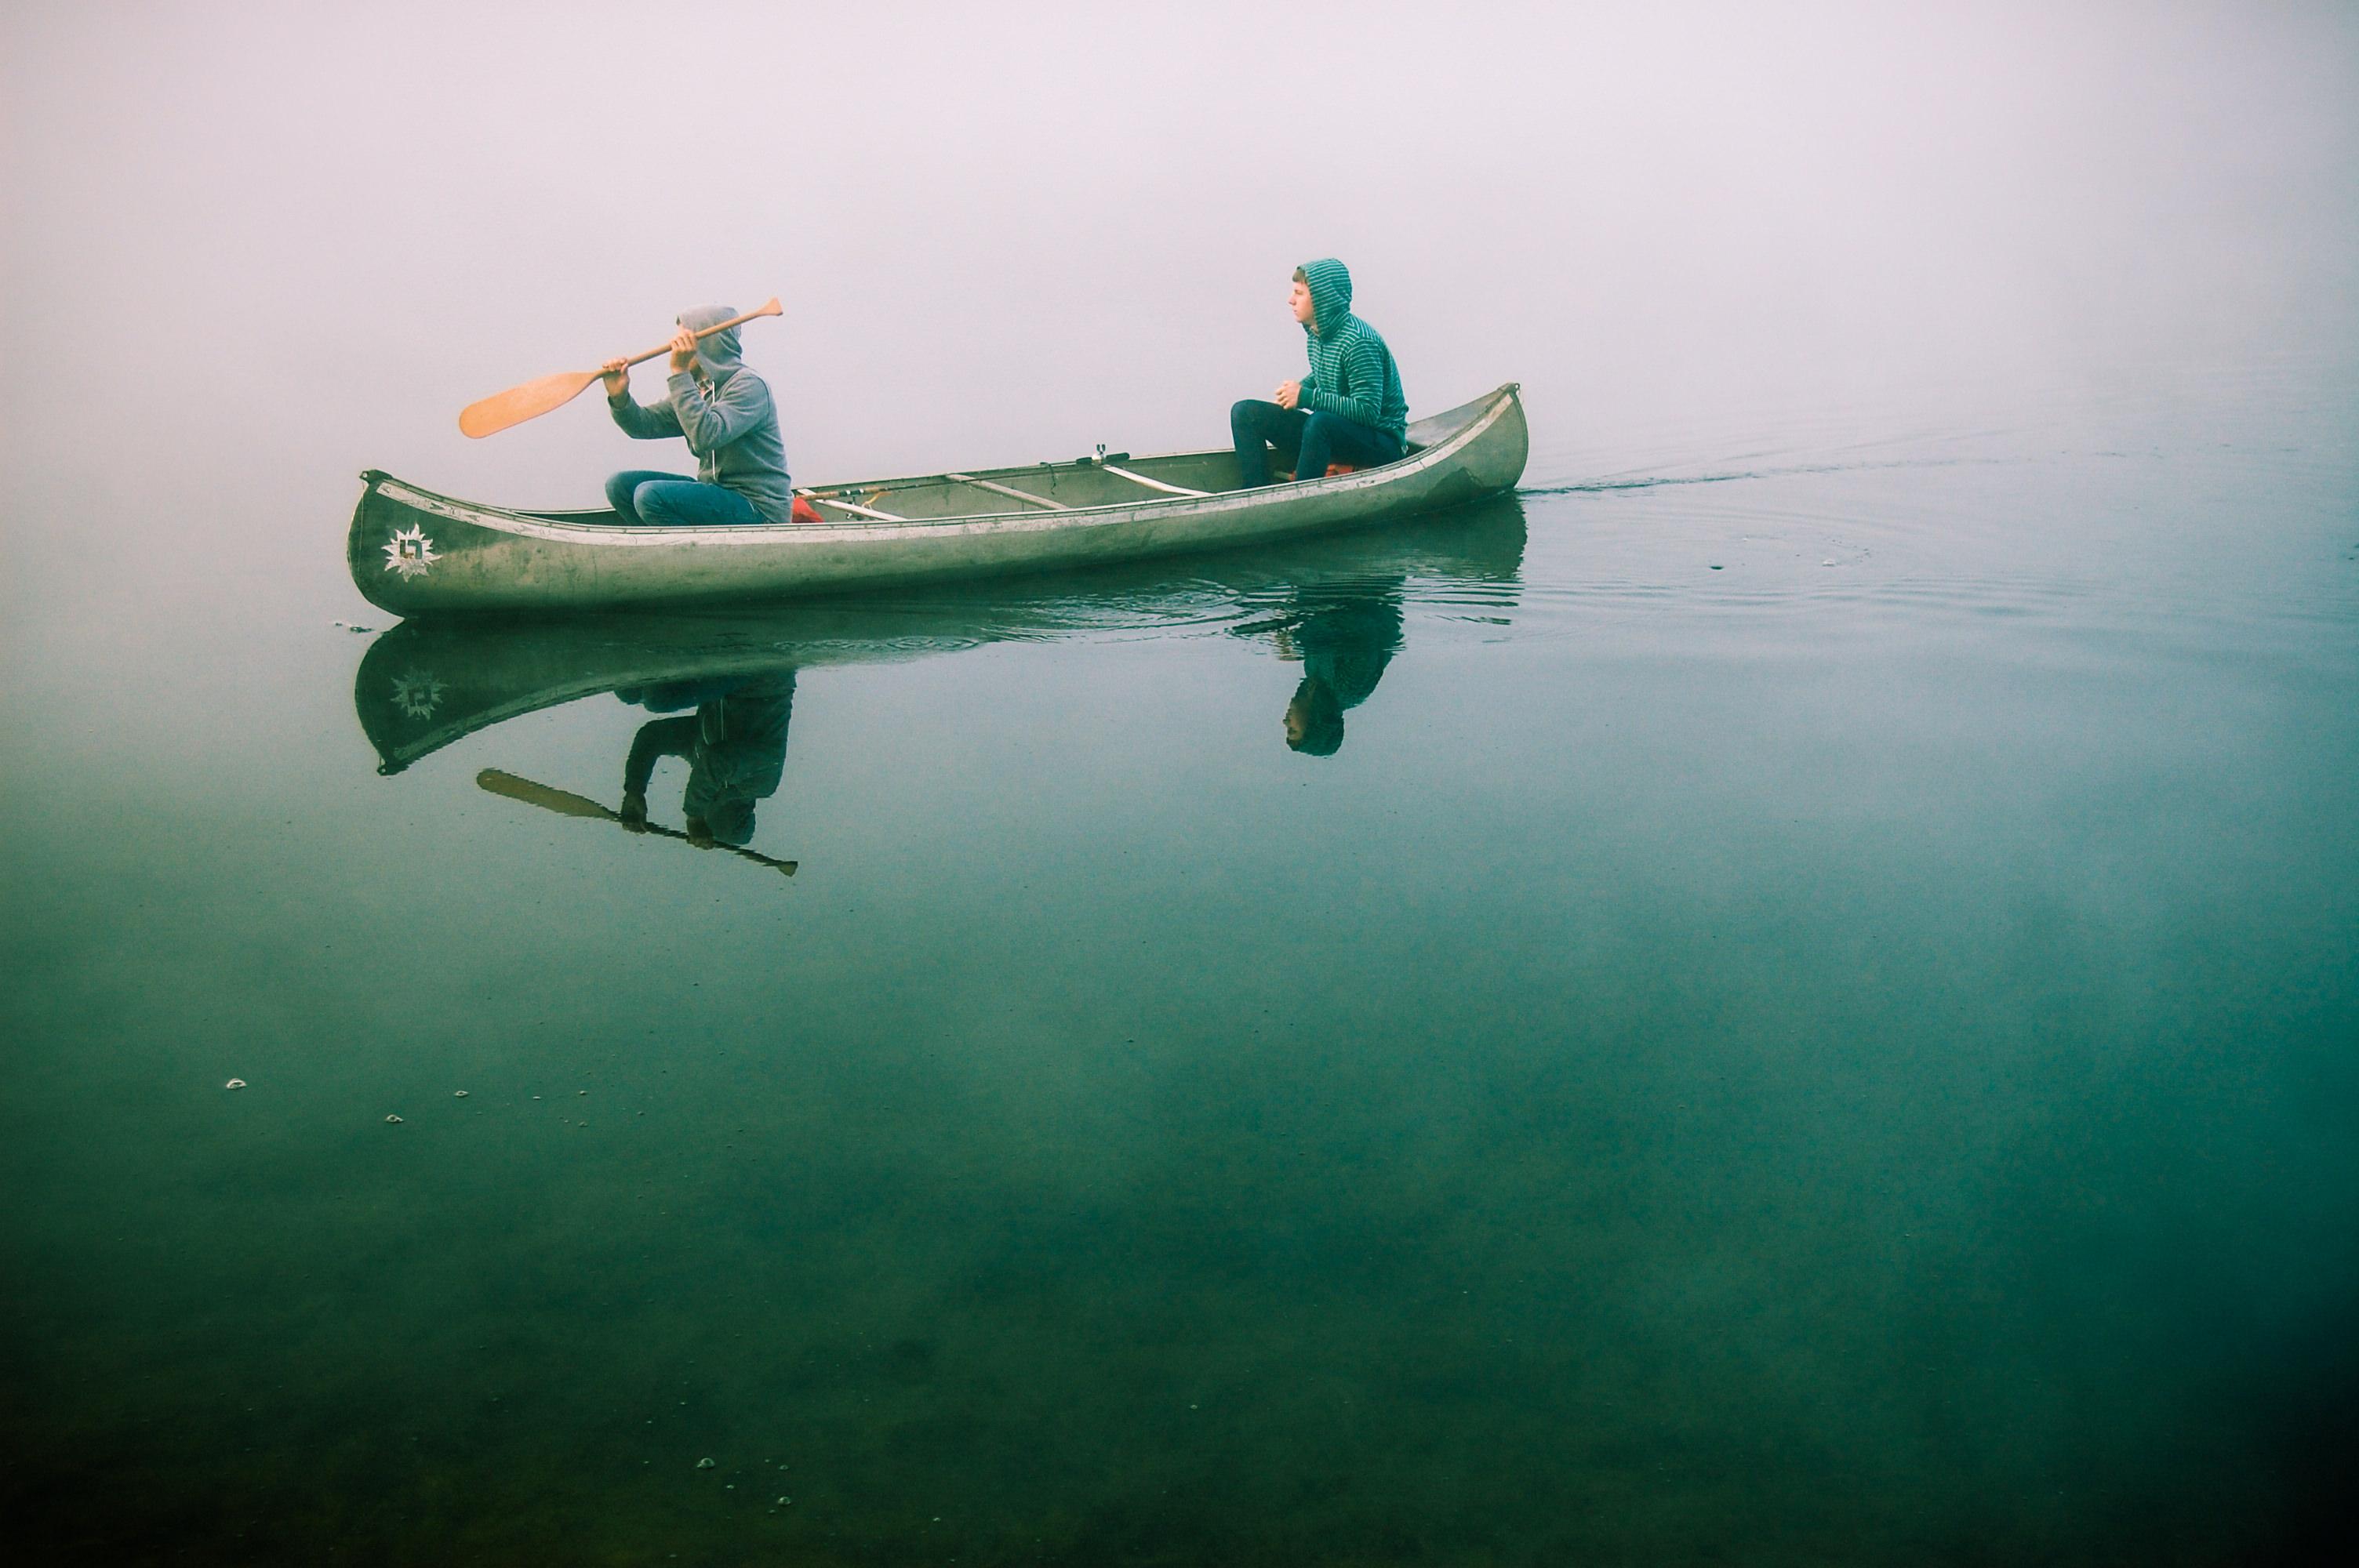 A photo by Matthew Clark. unsplash.com/photos/_IMinUHfUs0